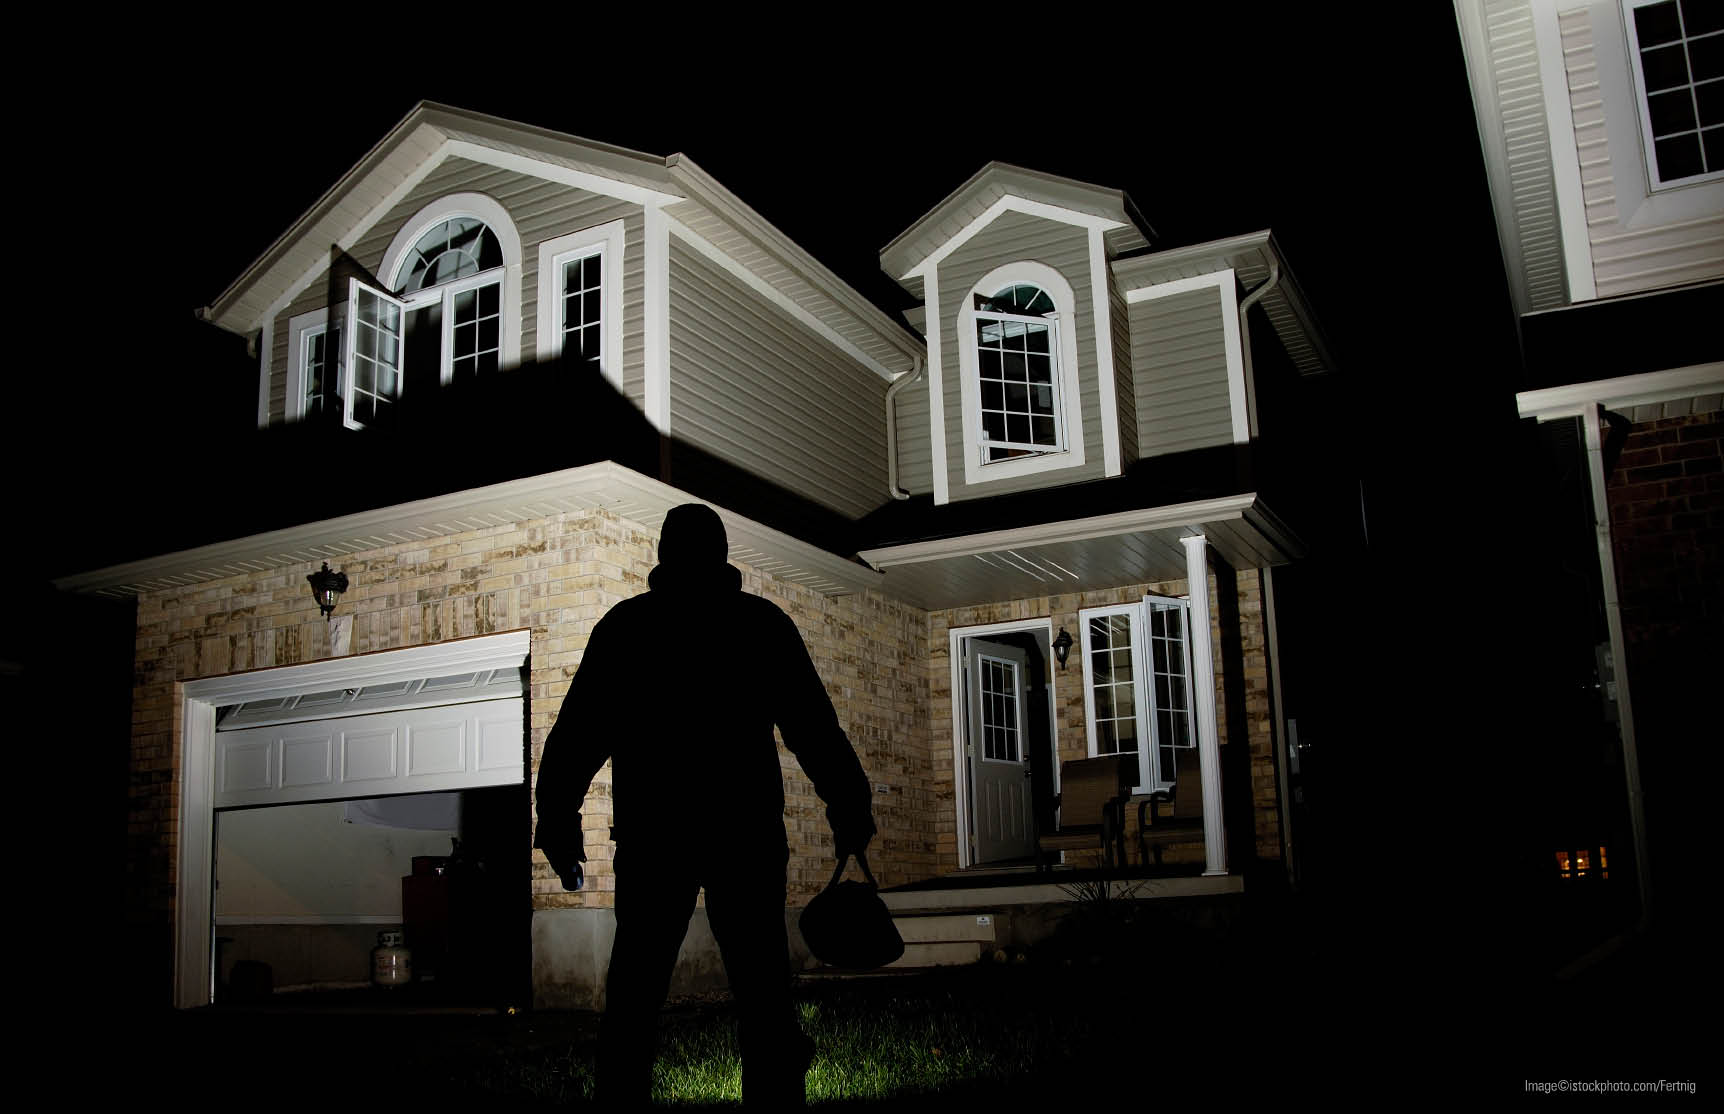 Burglar deterred by 4G alarm systems